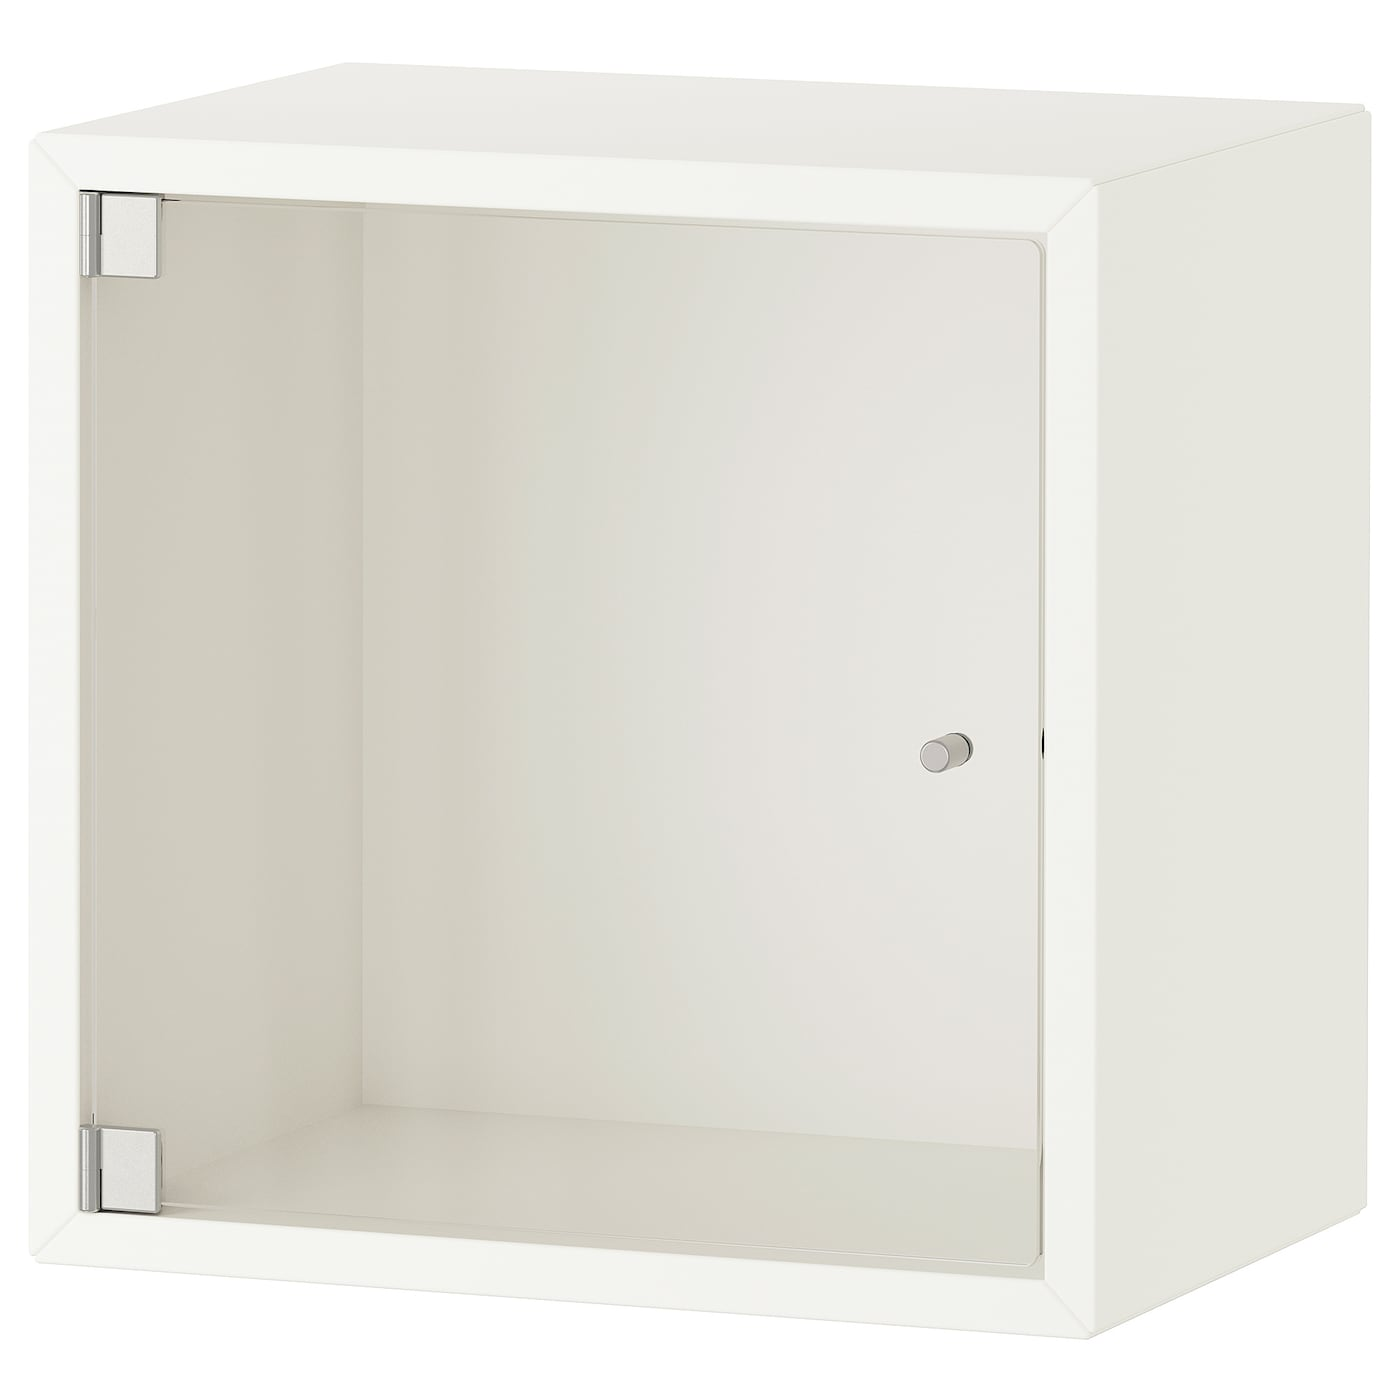 Eket Wall Cabinet With Glass Door White Ikea Canada Ikea